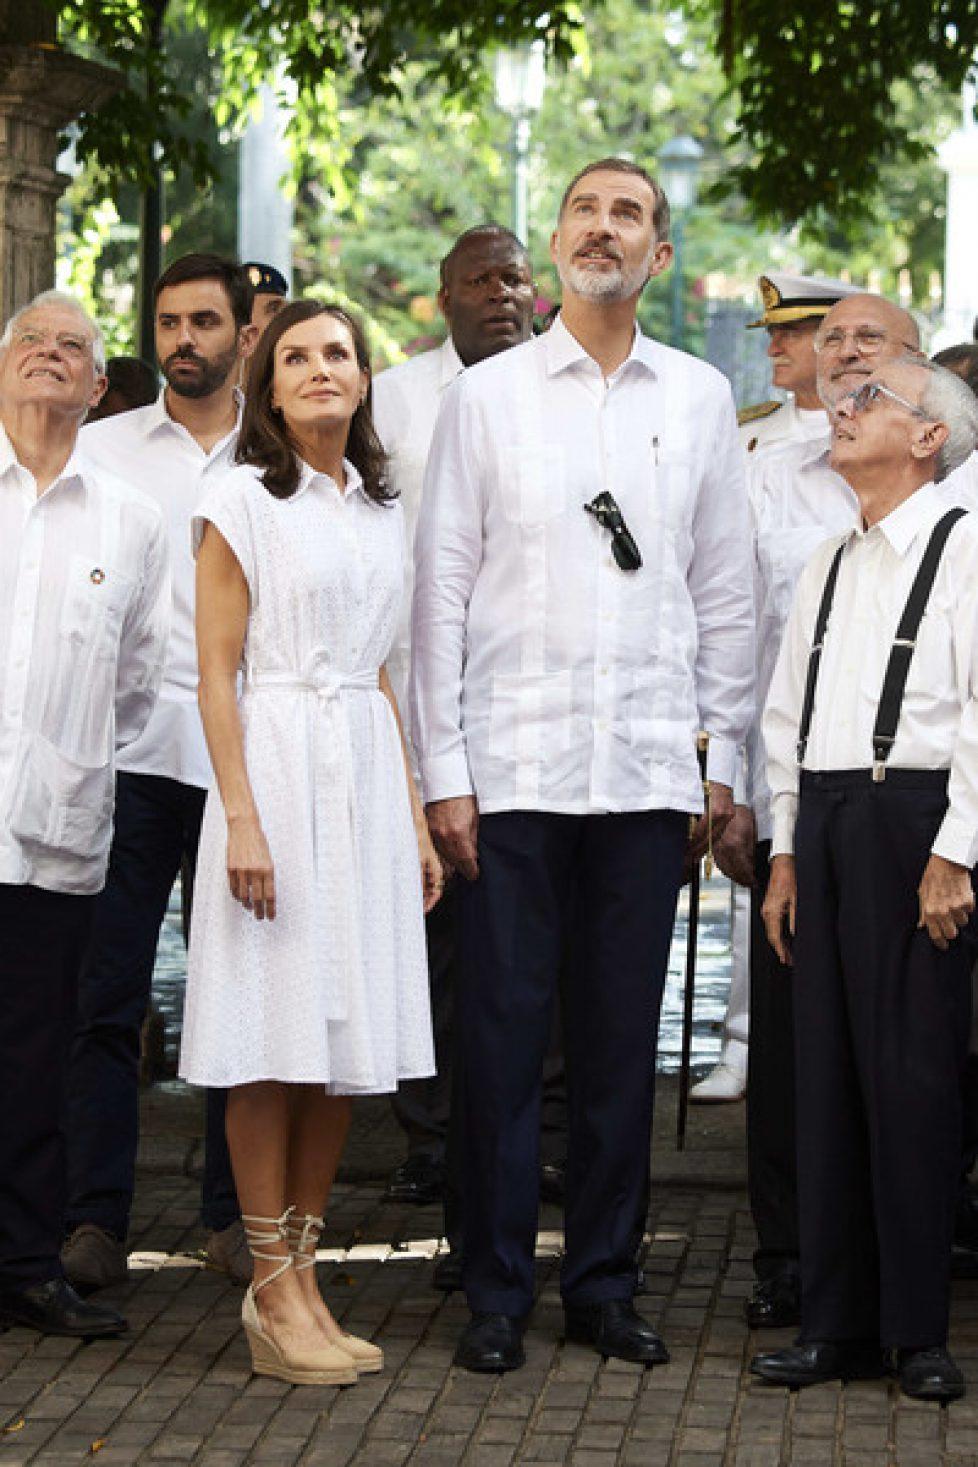 Day+2+Spanish+Royals+Visit+Cuba+2L7NG2pxSltl